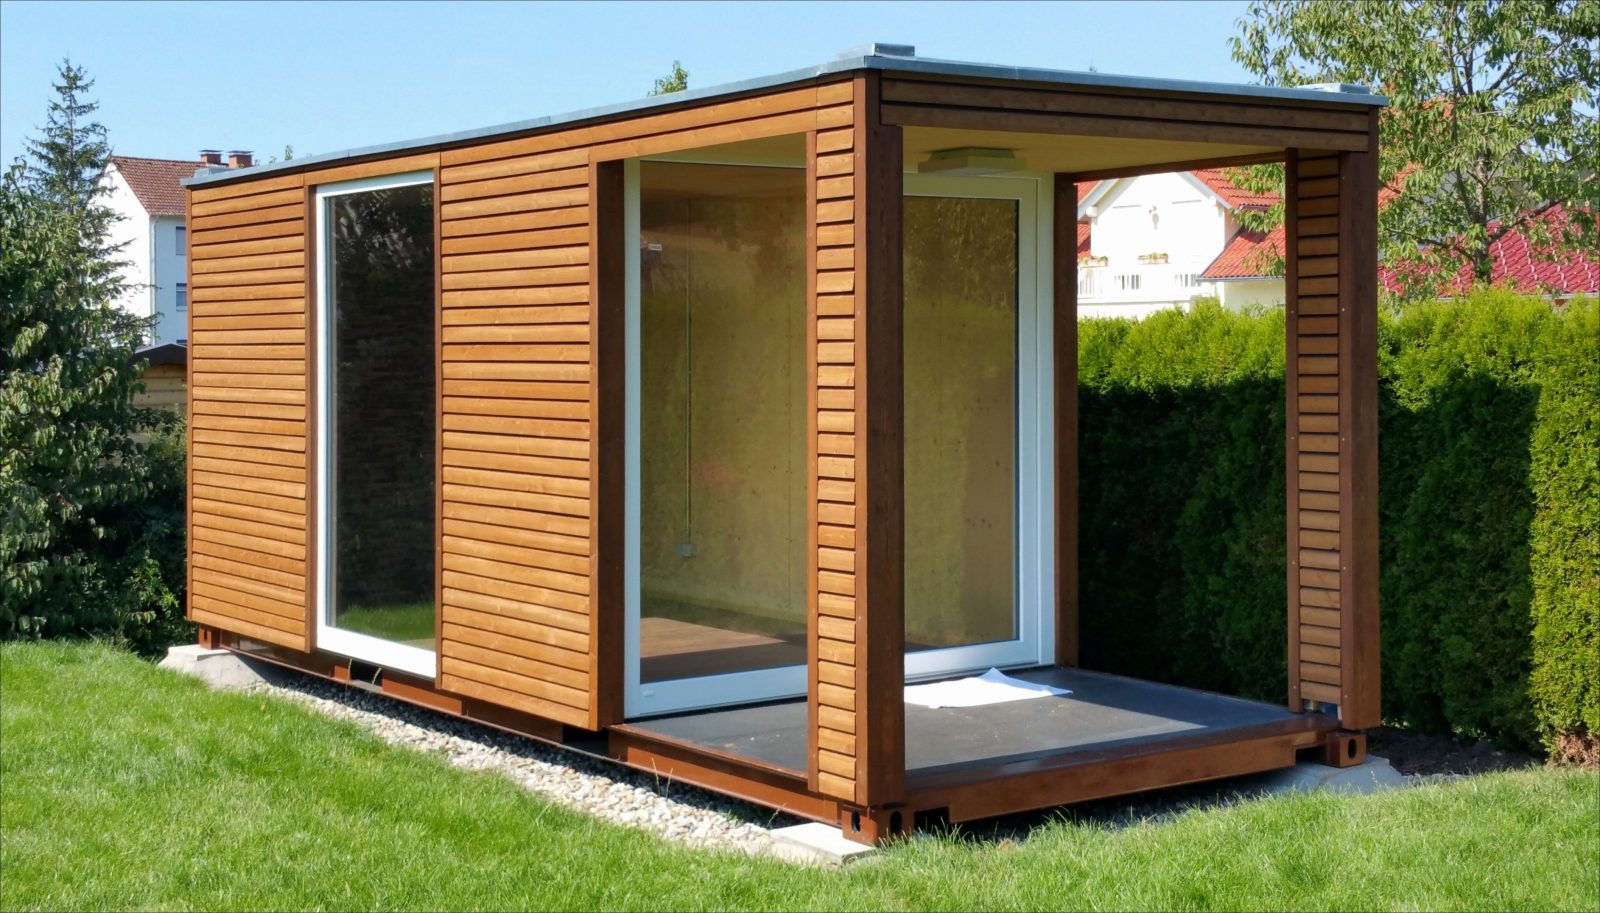 Gartenhaus modern selber bauen haus design ideen - Gartenhaus holz selber bauen ...